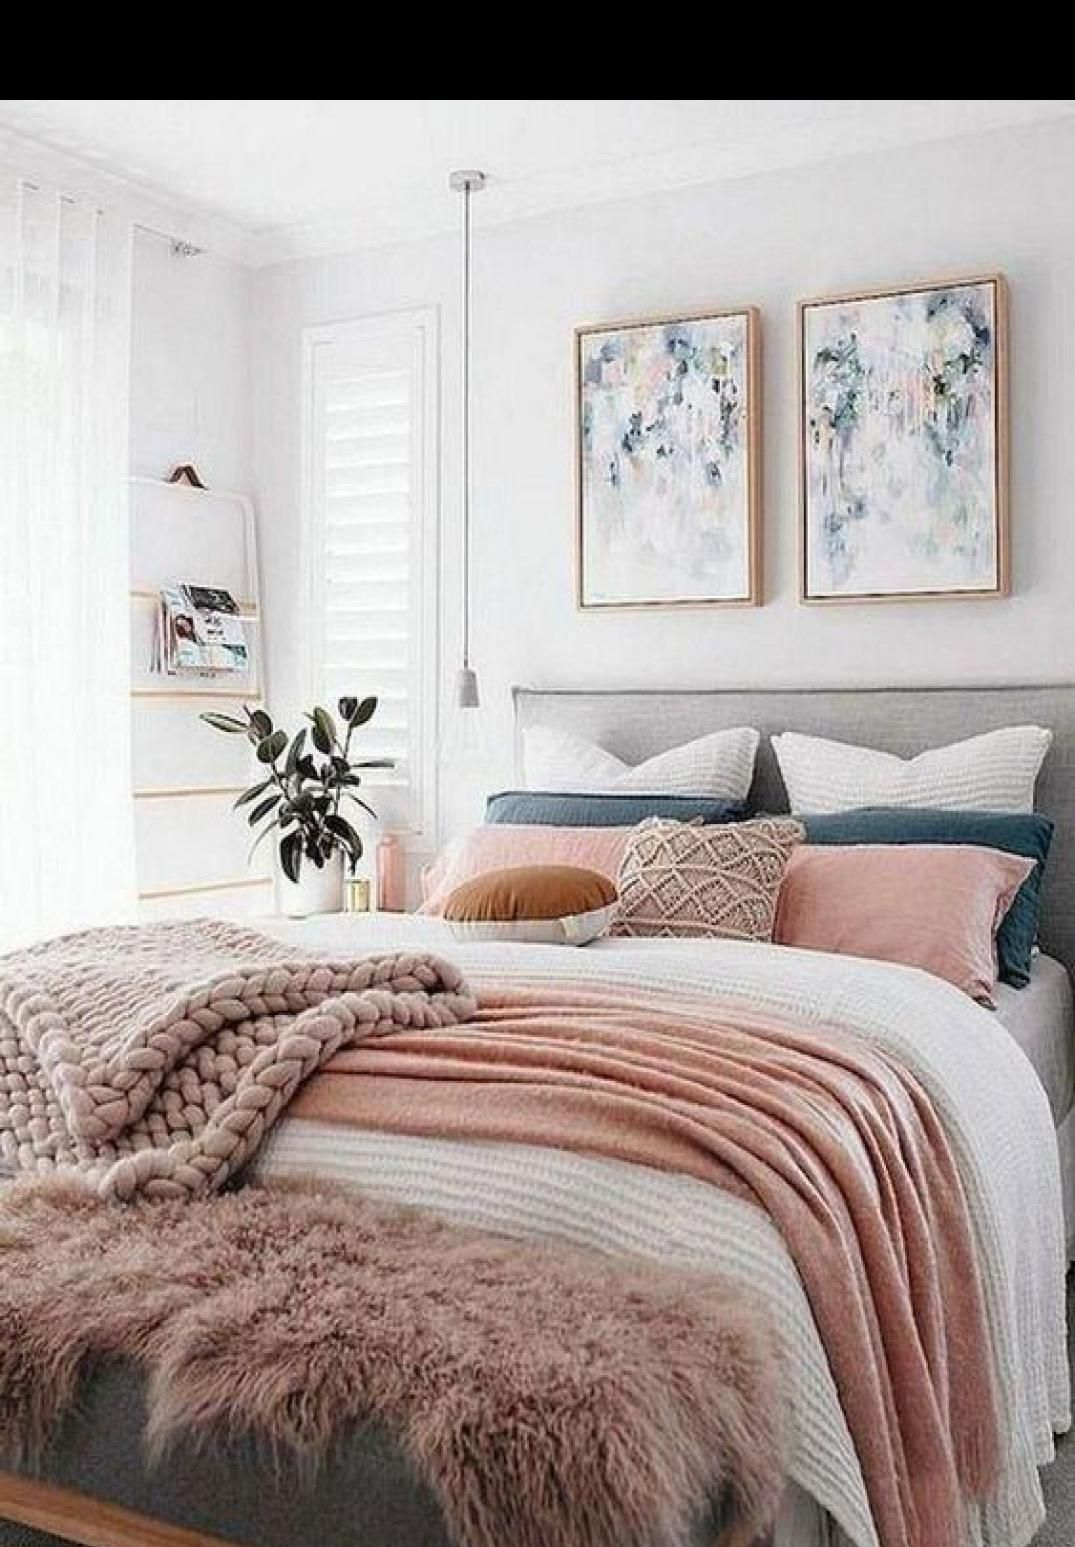 47 Cool Urban Farmhouse Master Bedroom Makeover Ideas Bedroom Interior Home Decor Bedroom Bedroom Makeover Urban master bedroom ideas